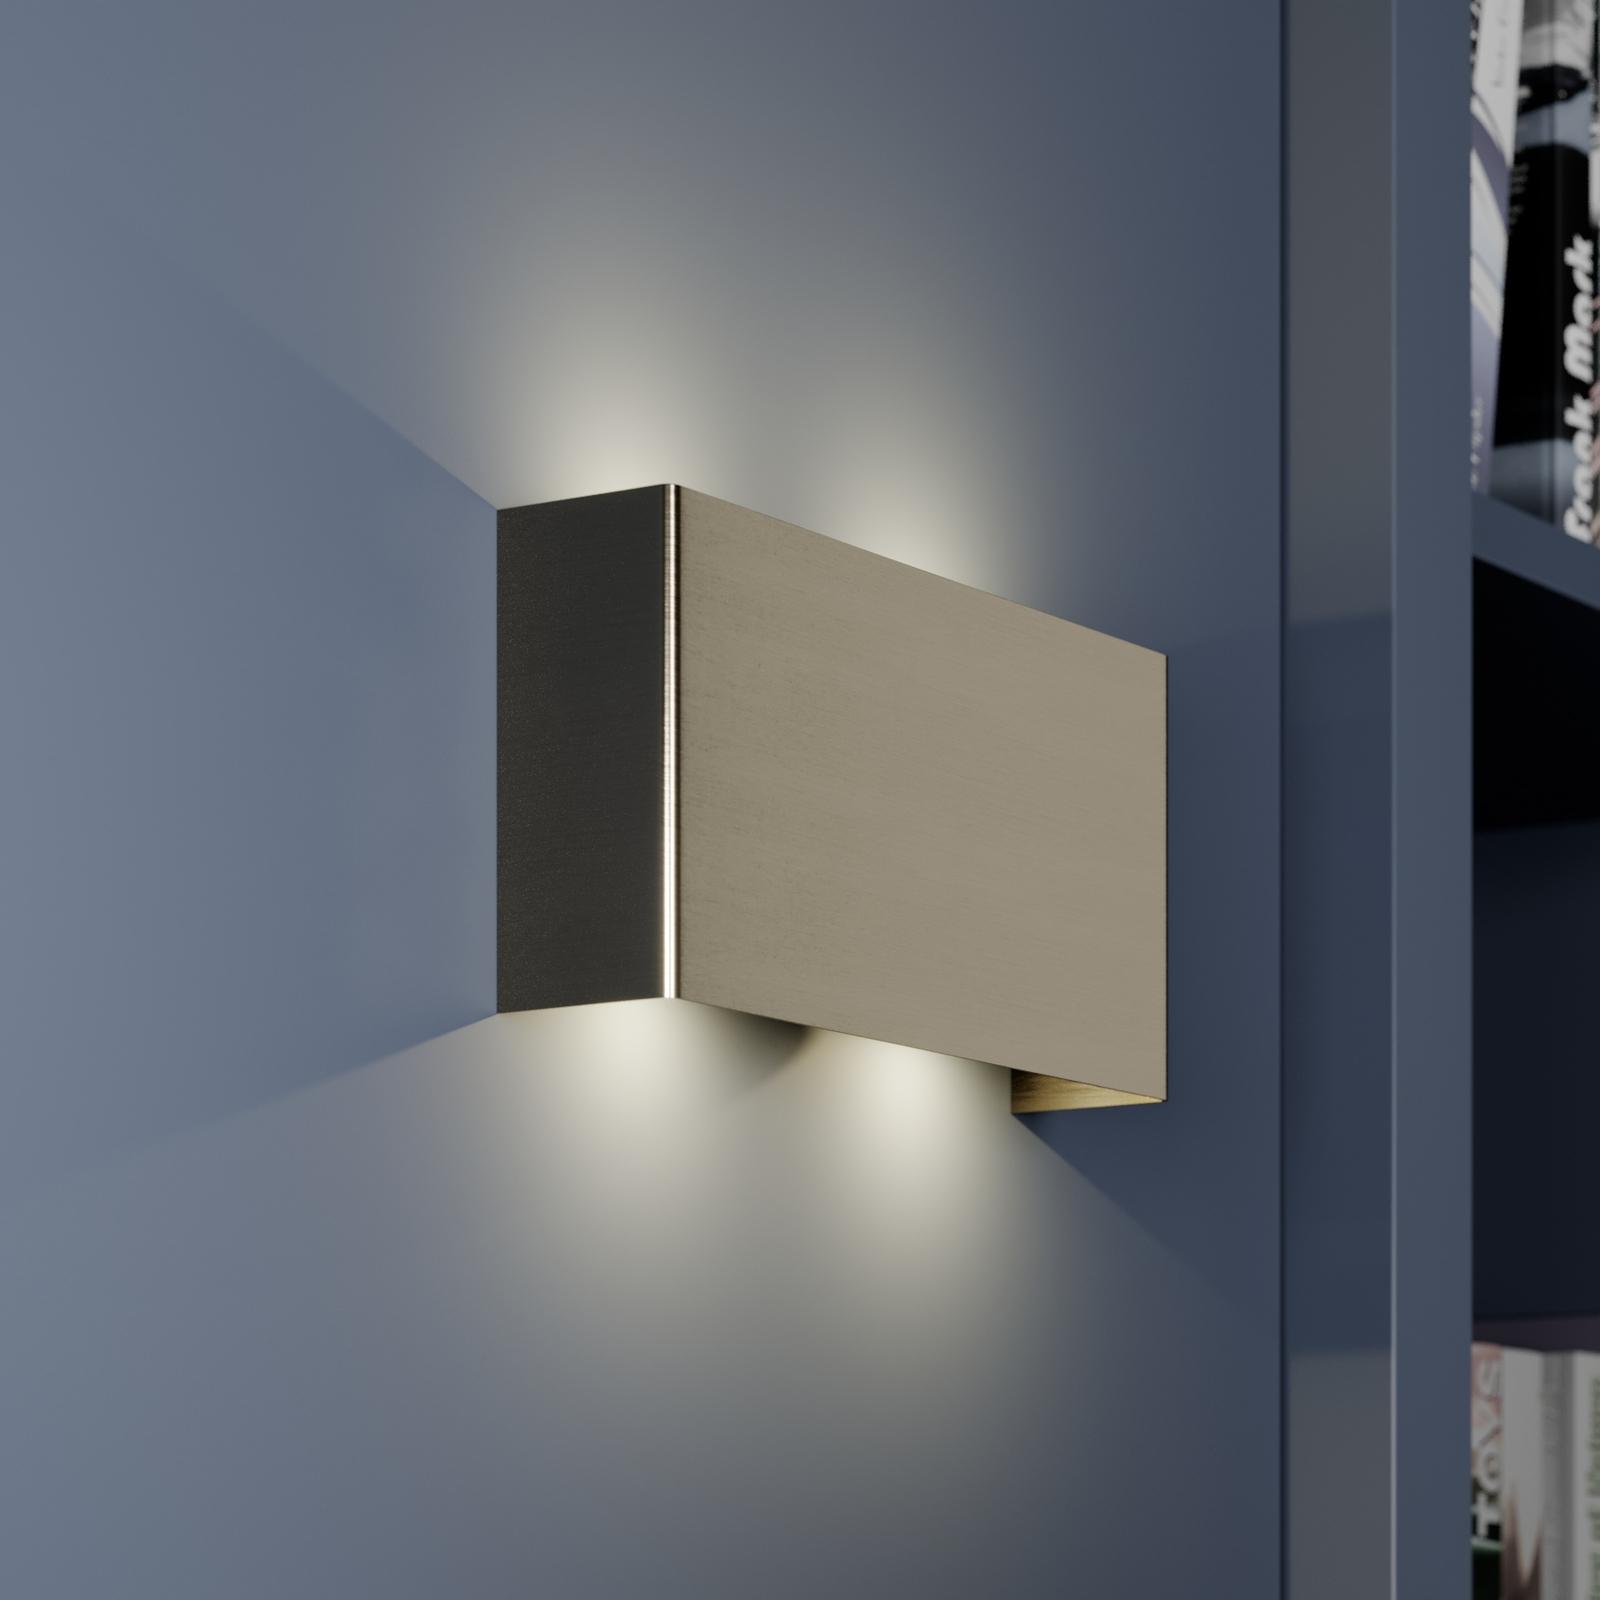 Maja - LED-vegglampe, 22 cm